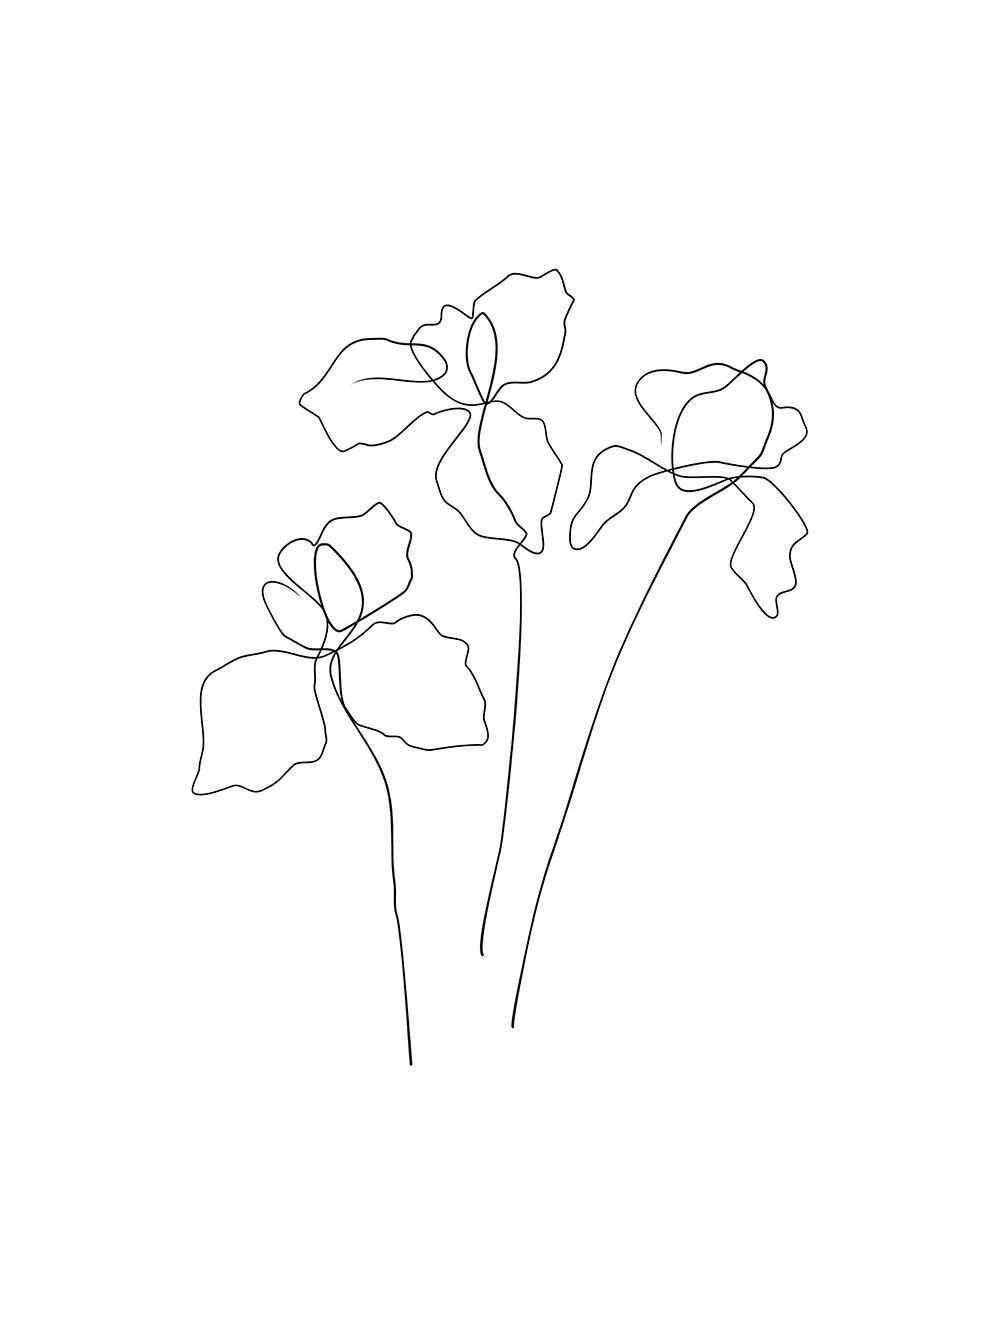 Iris Flower One Line Drawing Minimalist Poster Elumina Shop In 2020 Flower Line Drawings Line Drawing Tattoos Iris Drawing